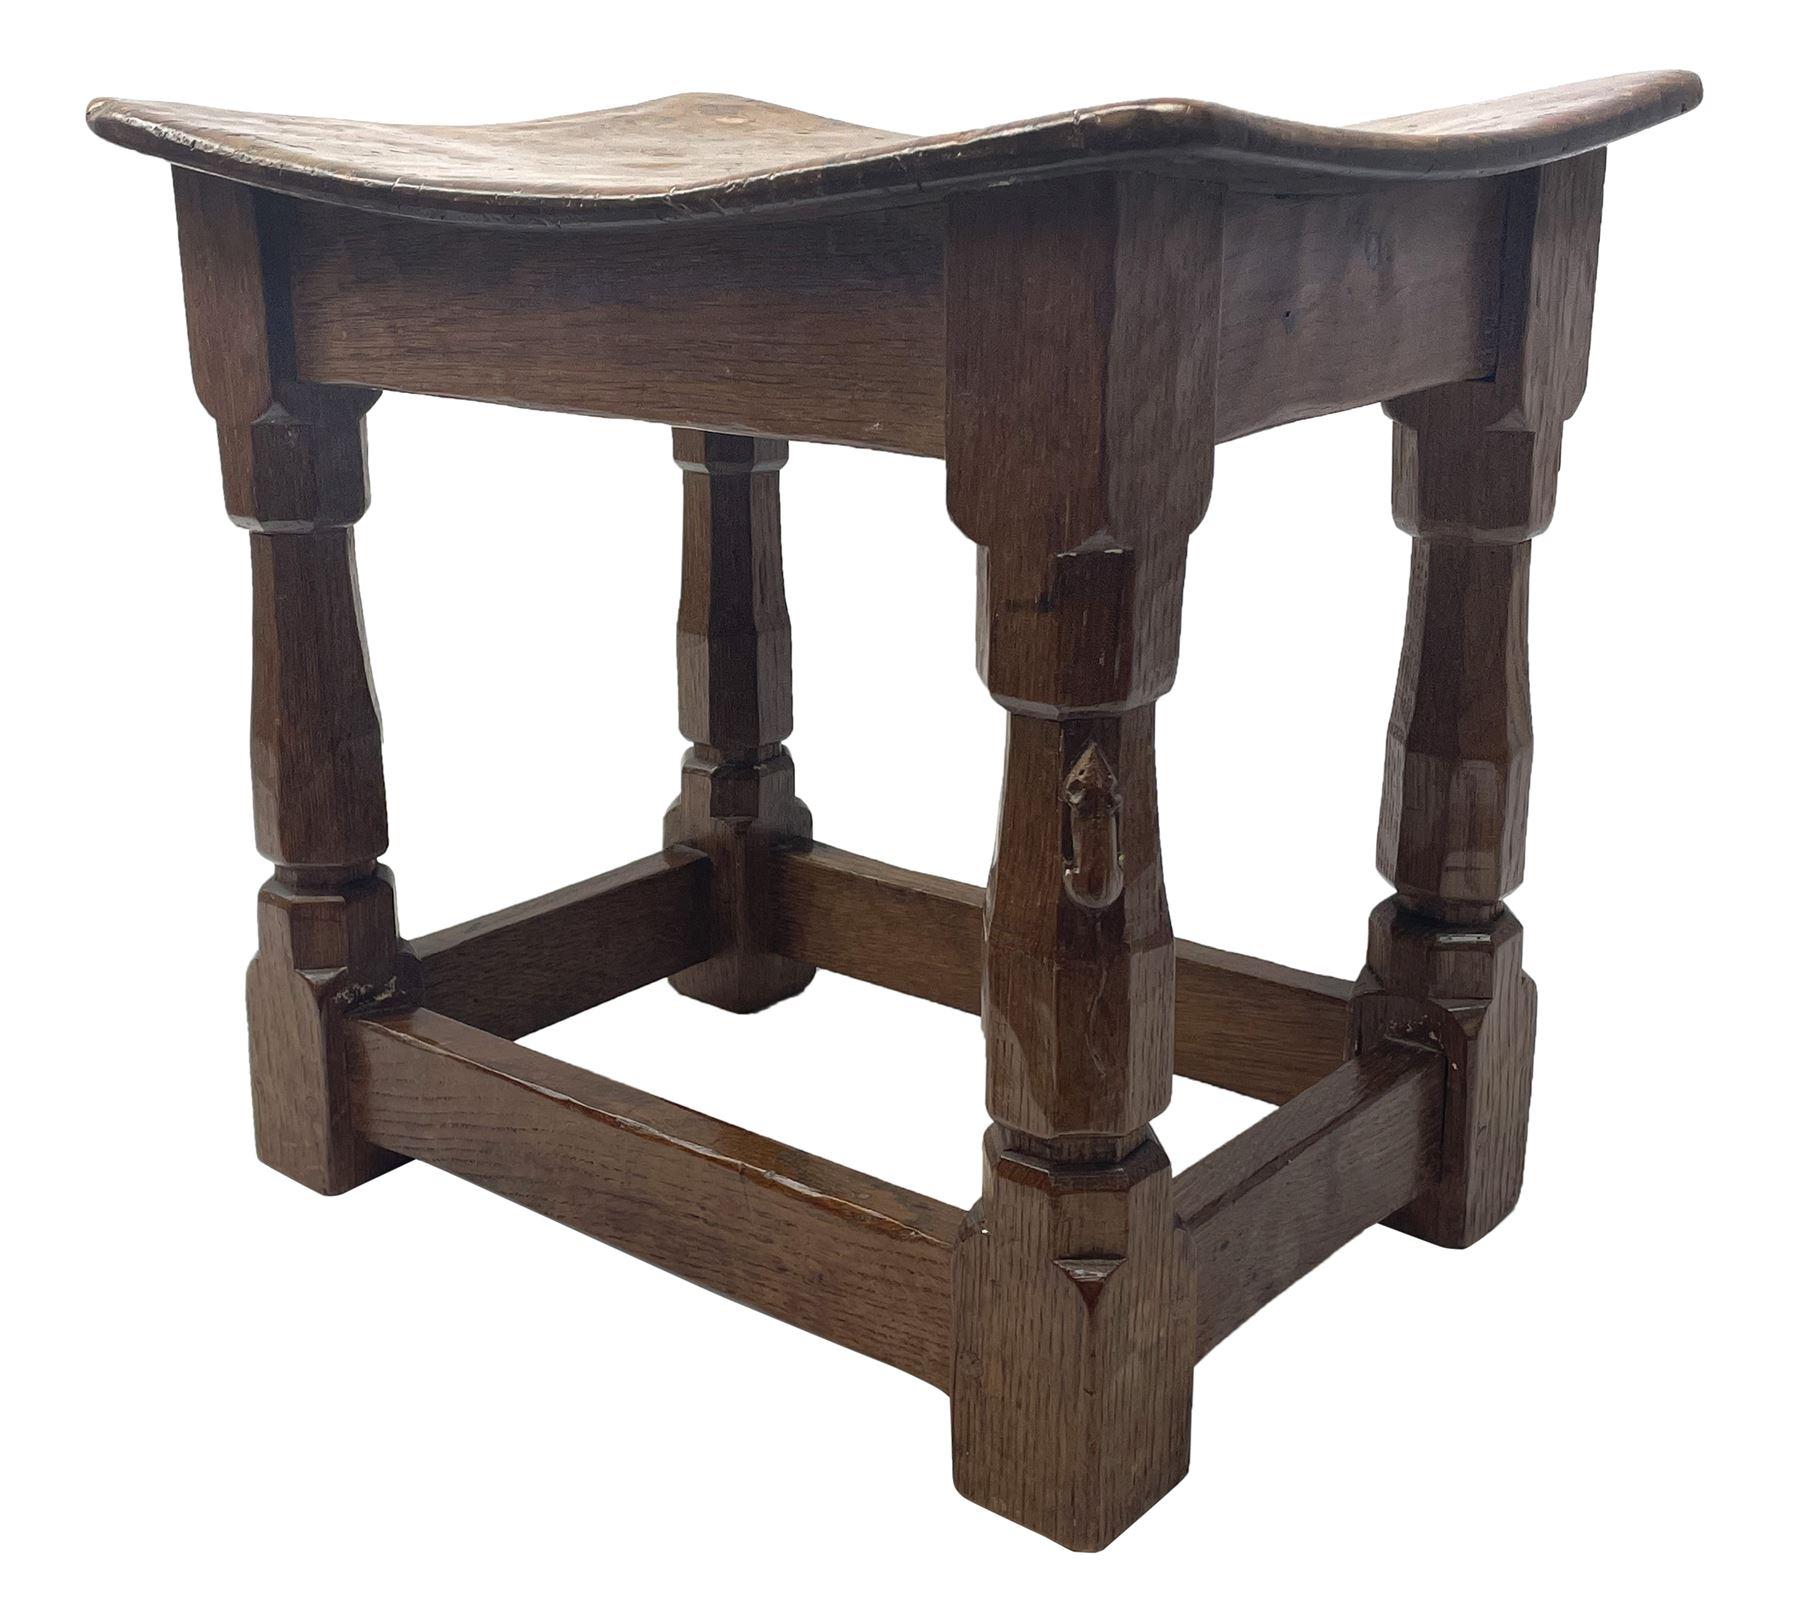 'Mouseman' 1940s adzed oak joint stool - Image 2 of 7